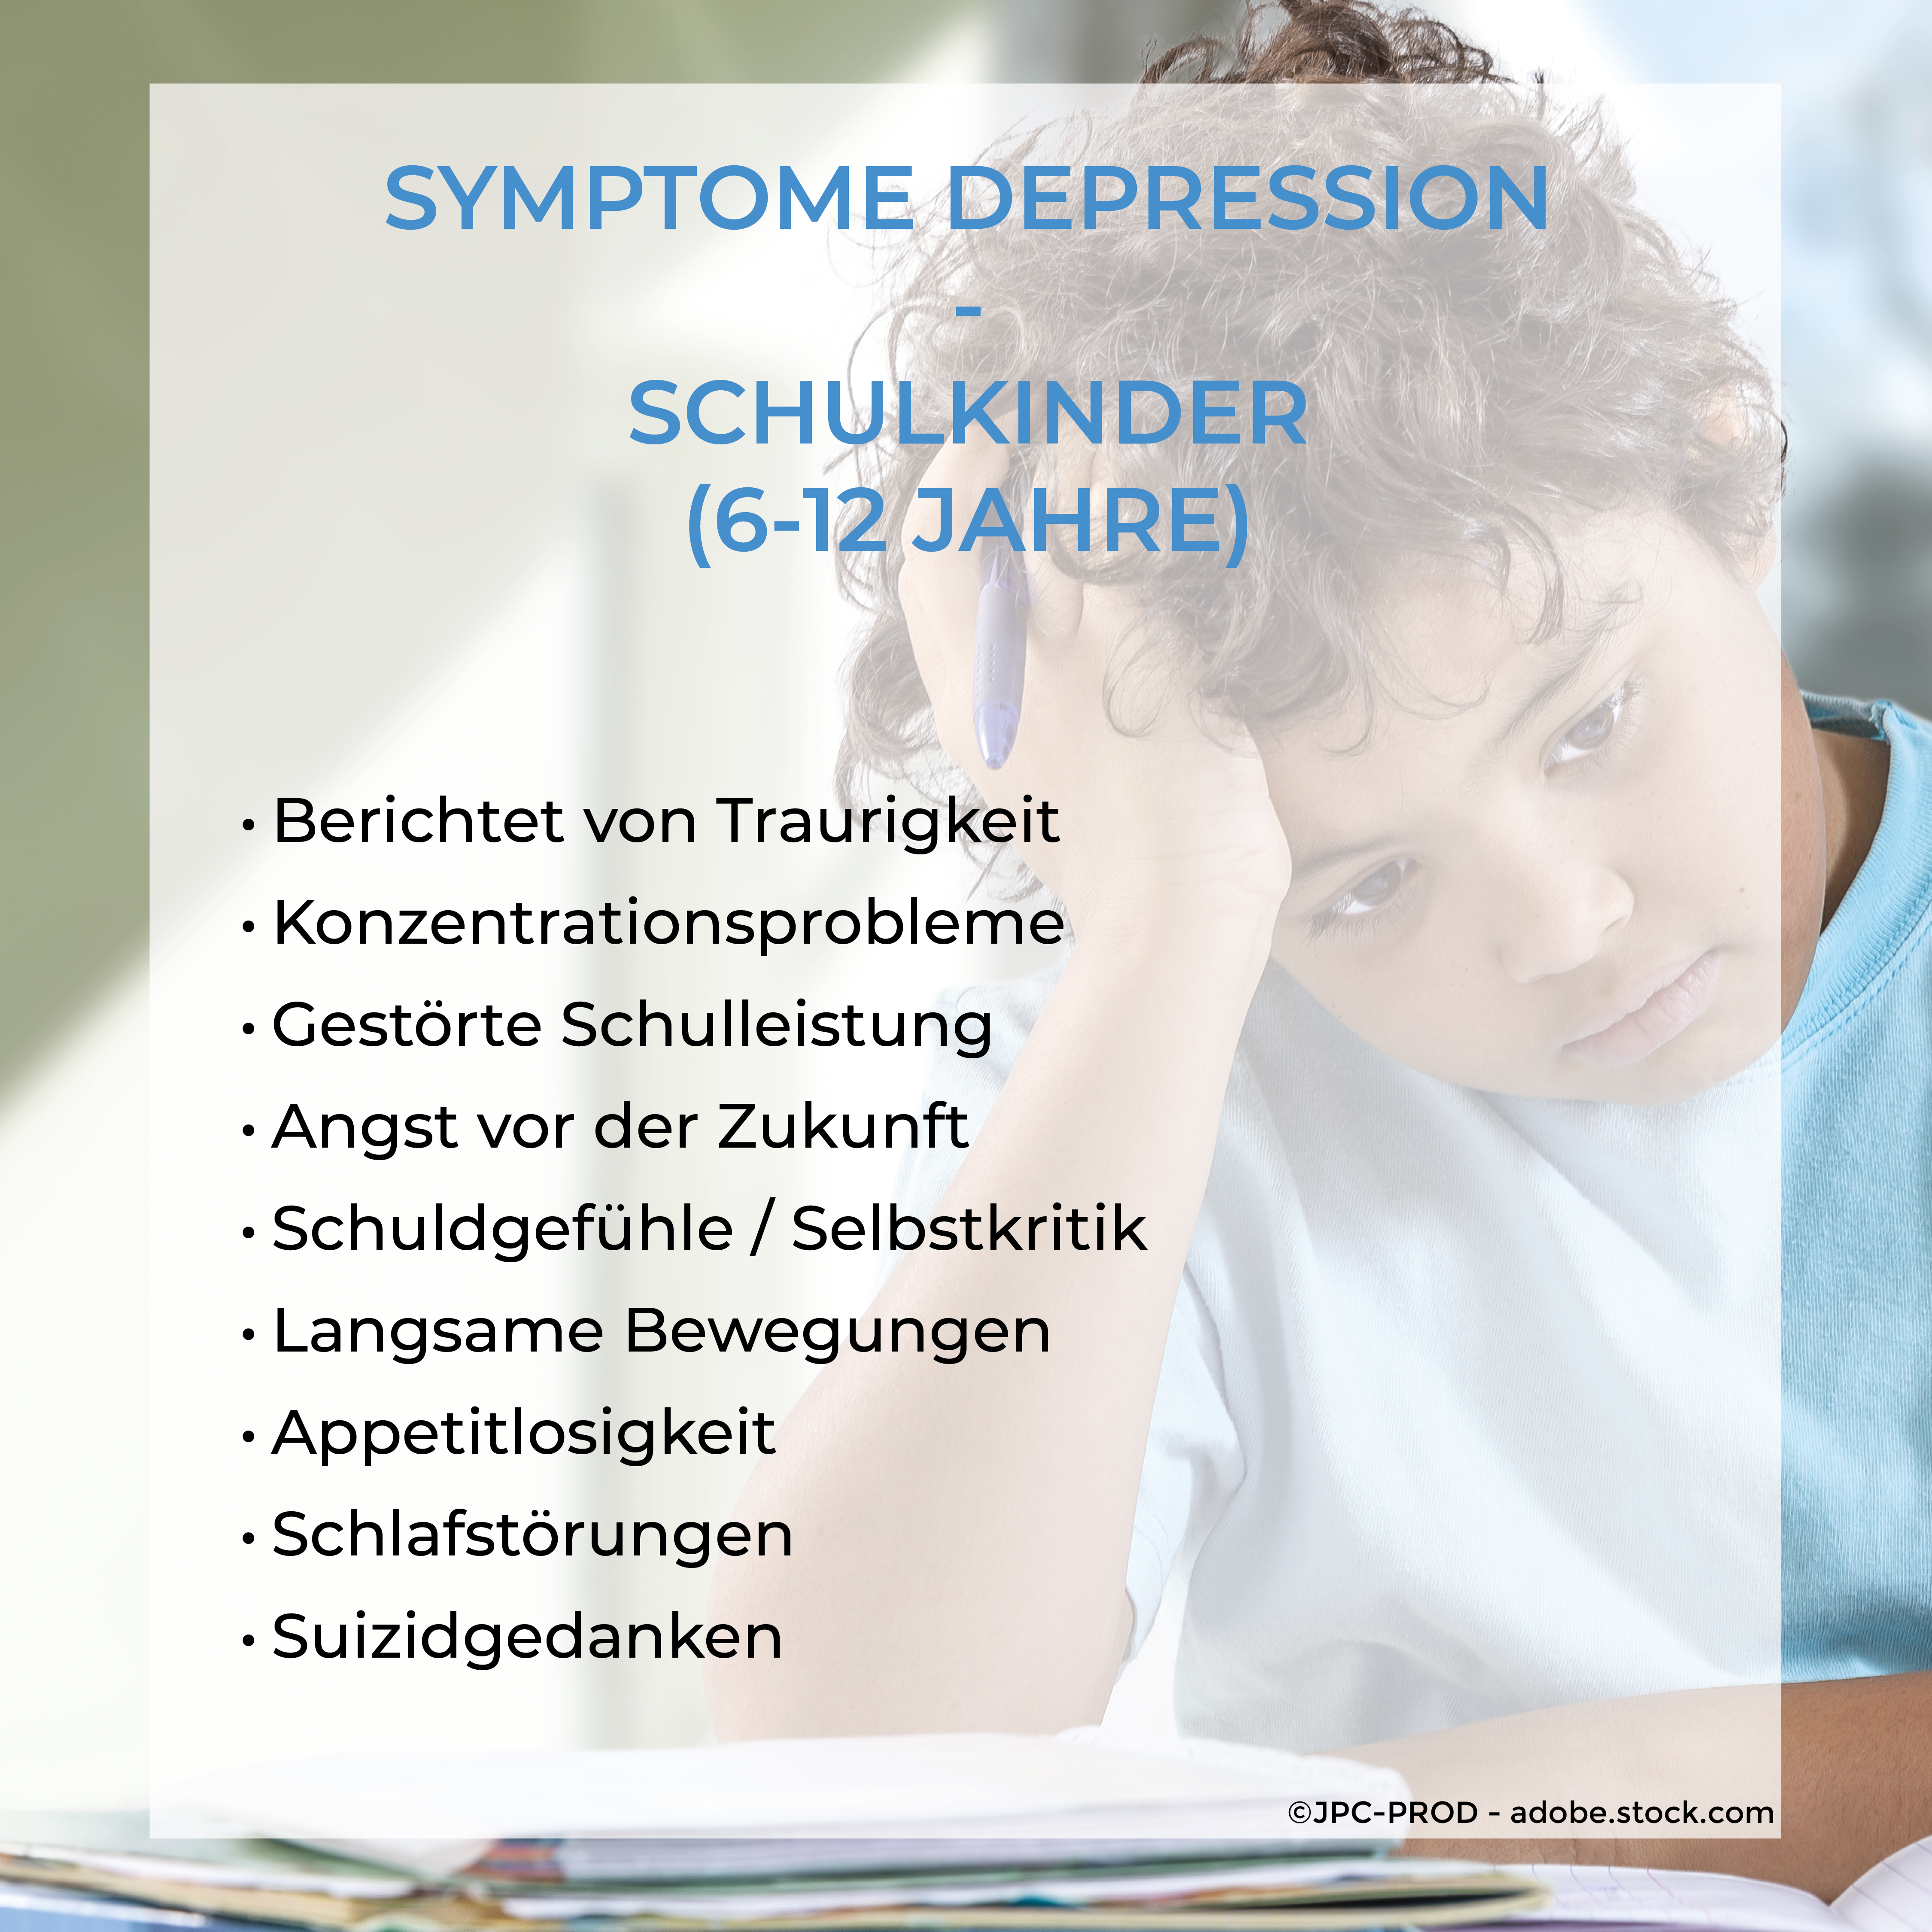 Schulkinder Symptome Depression